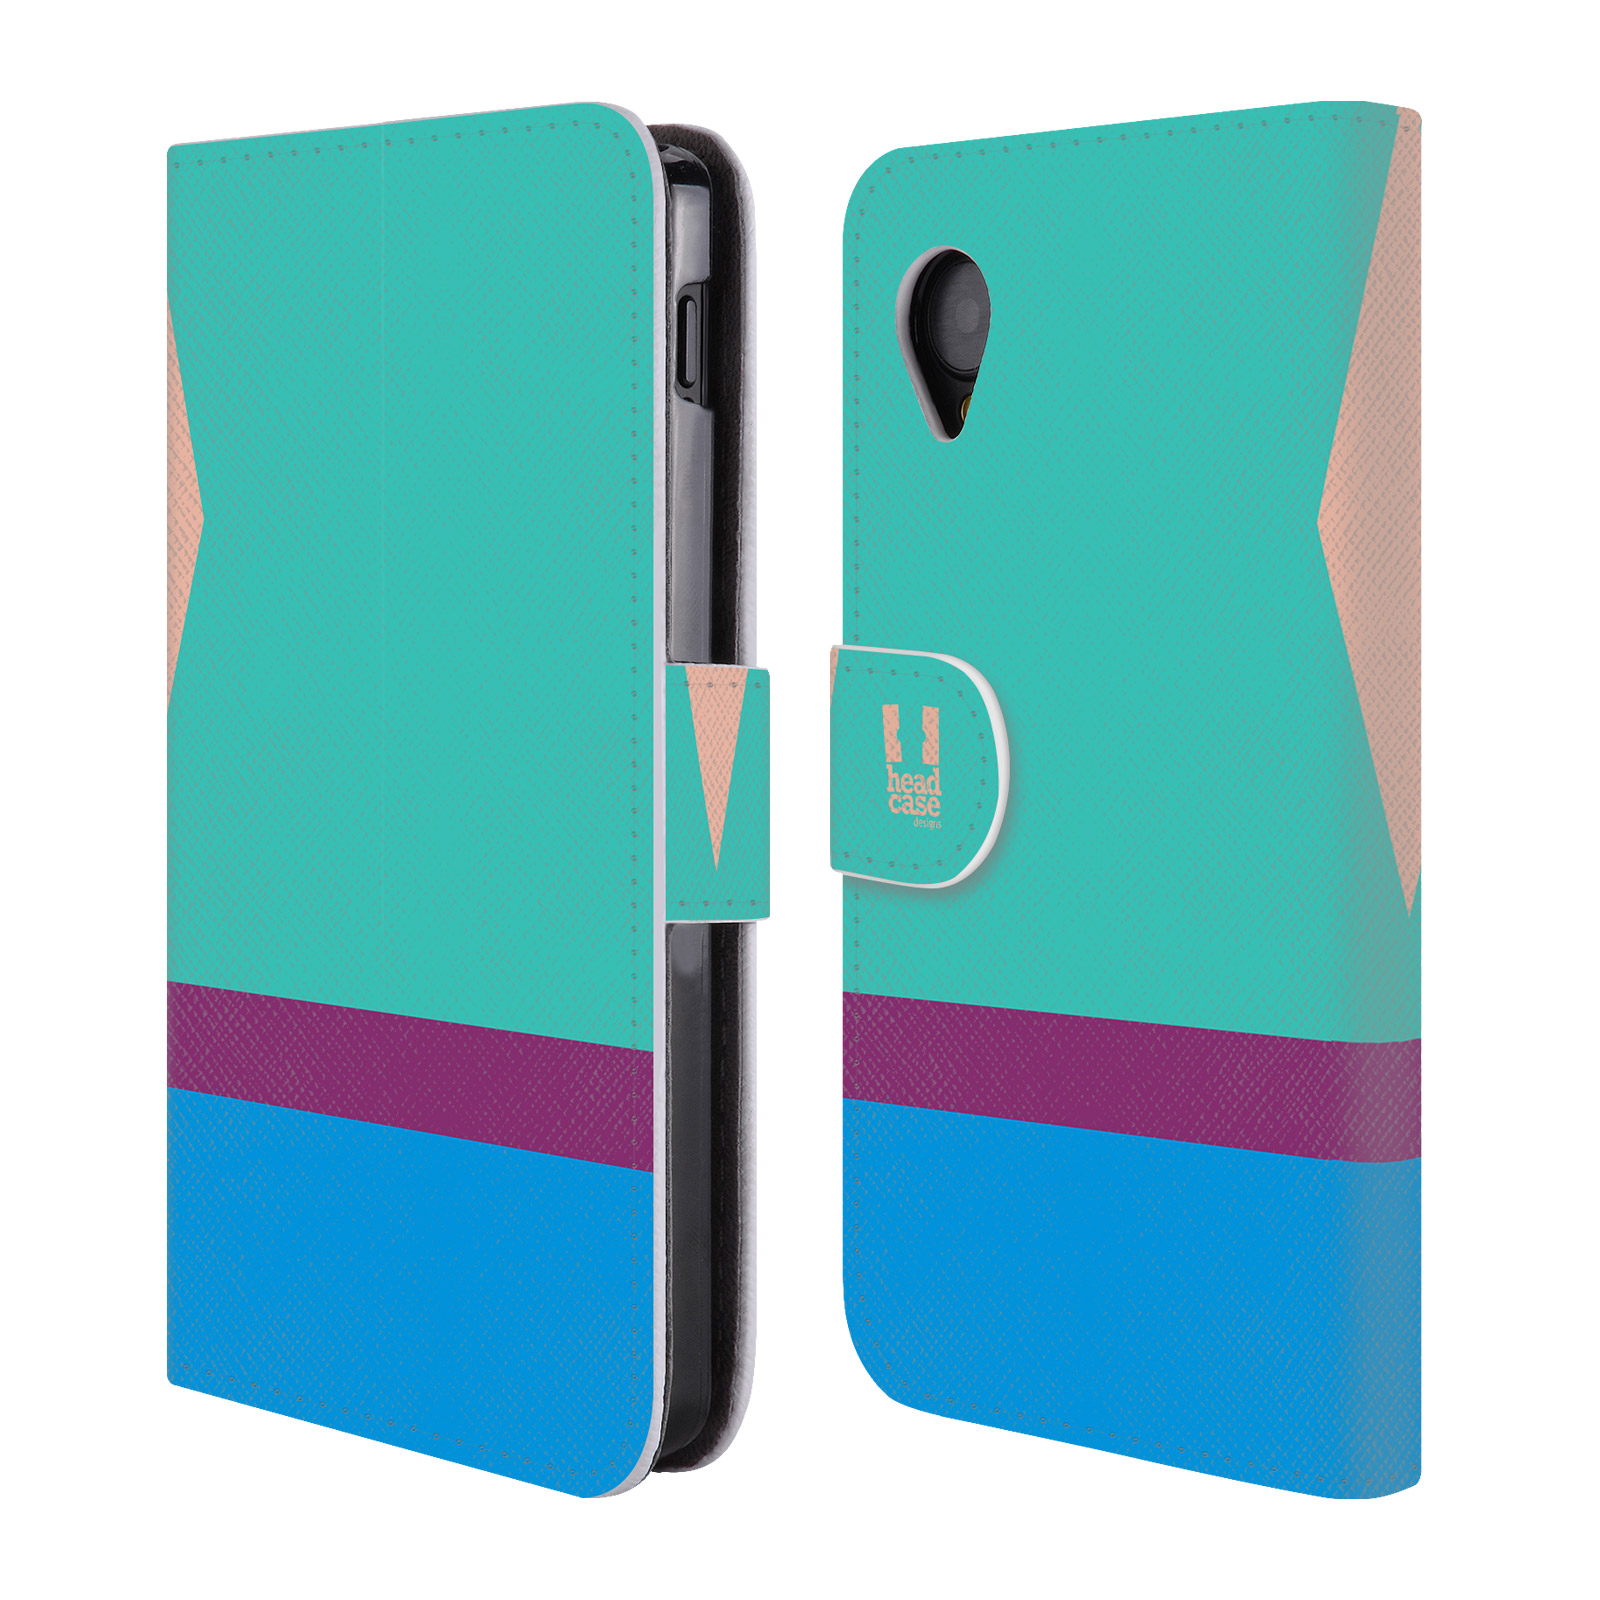 HEAD CASE Flipové pouzdro pro mobil LG GOOGLE NEXUS 5 barevné tvary modrá a fialový pruh